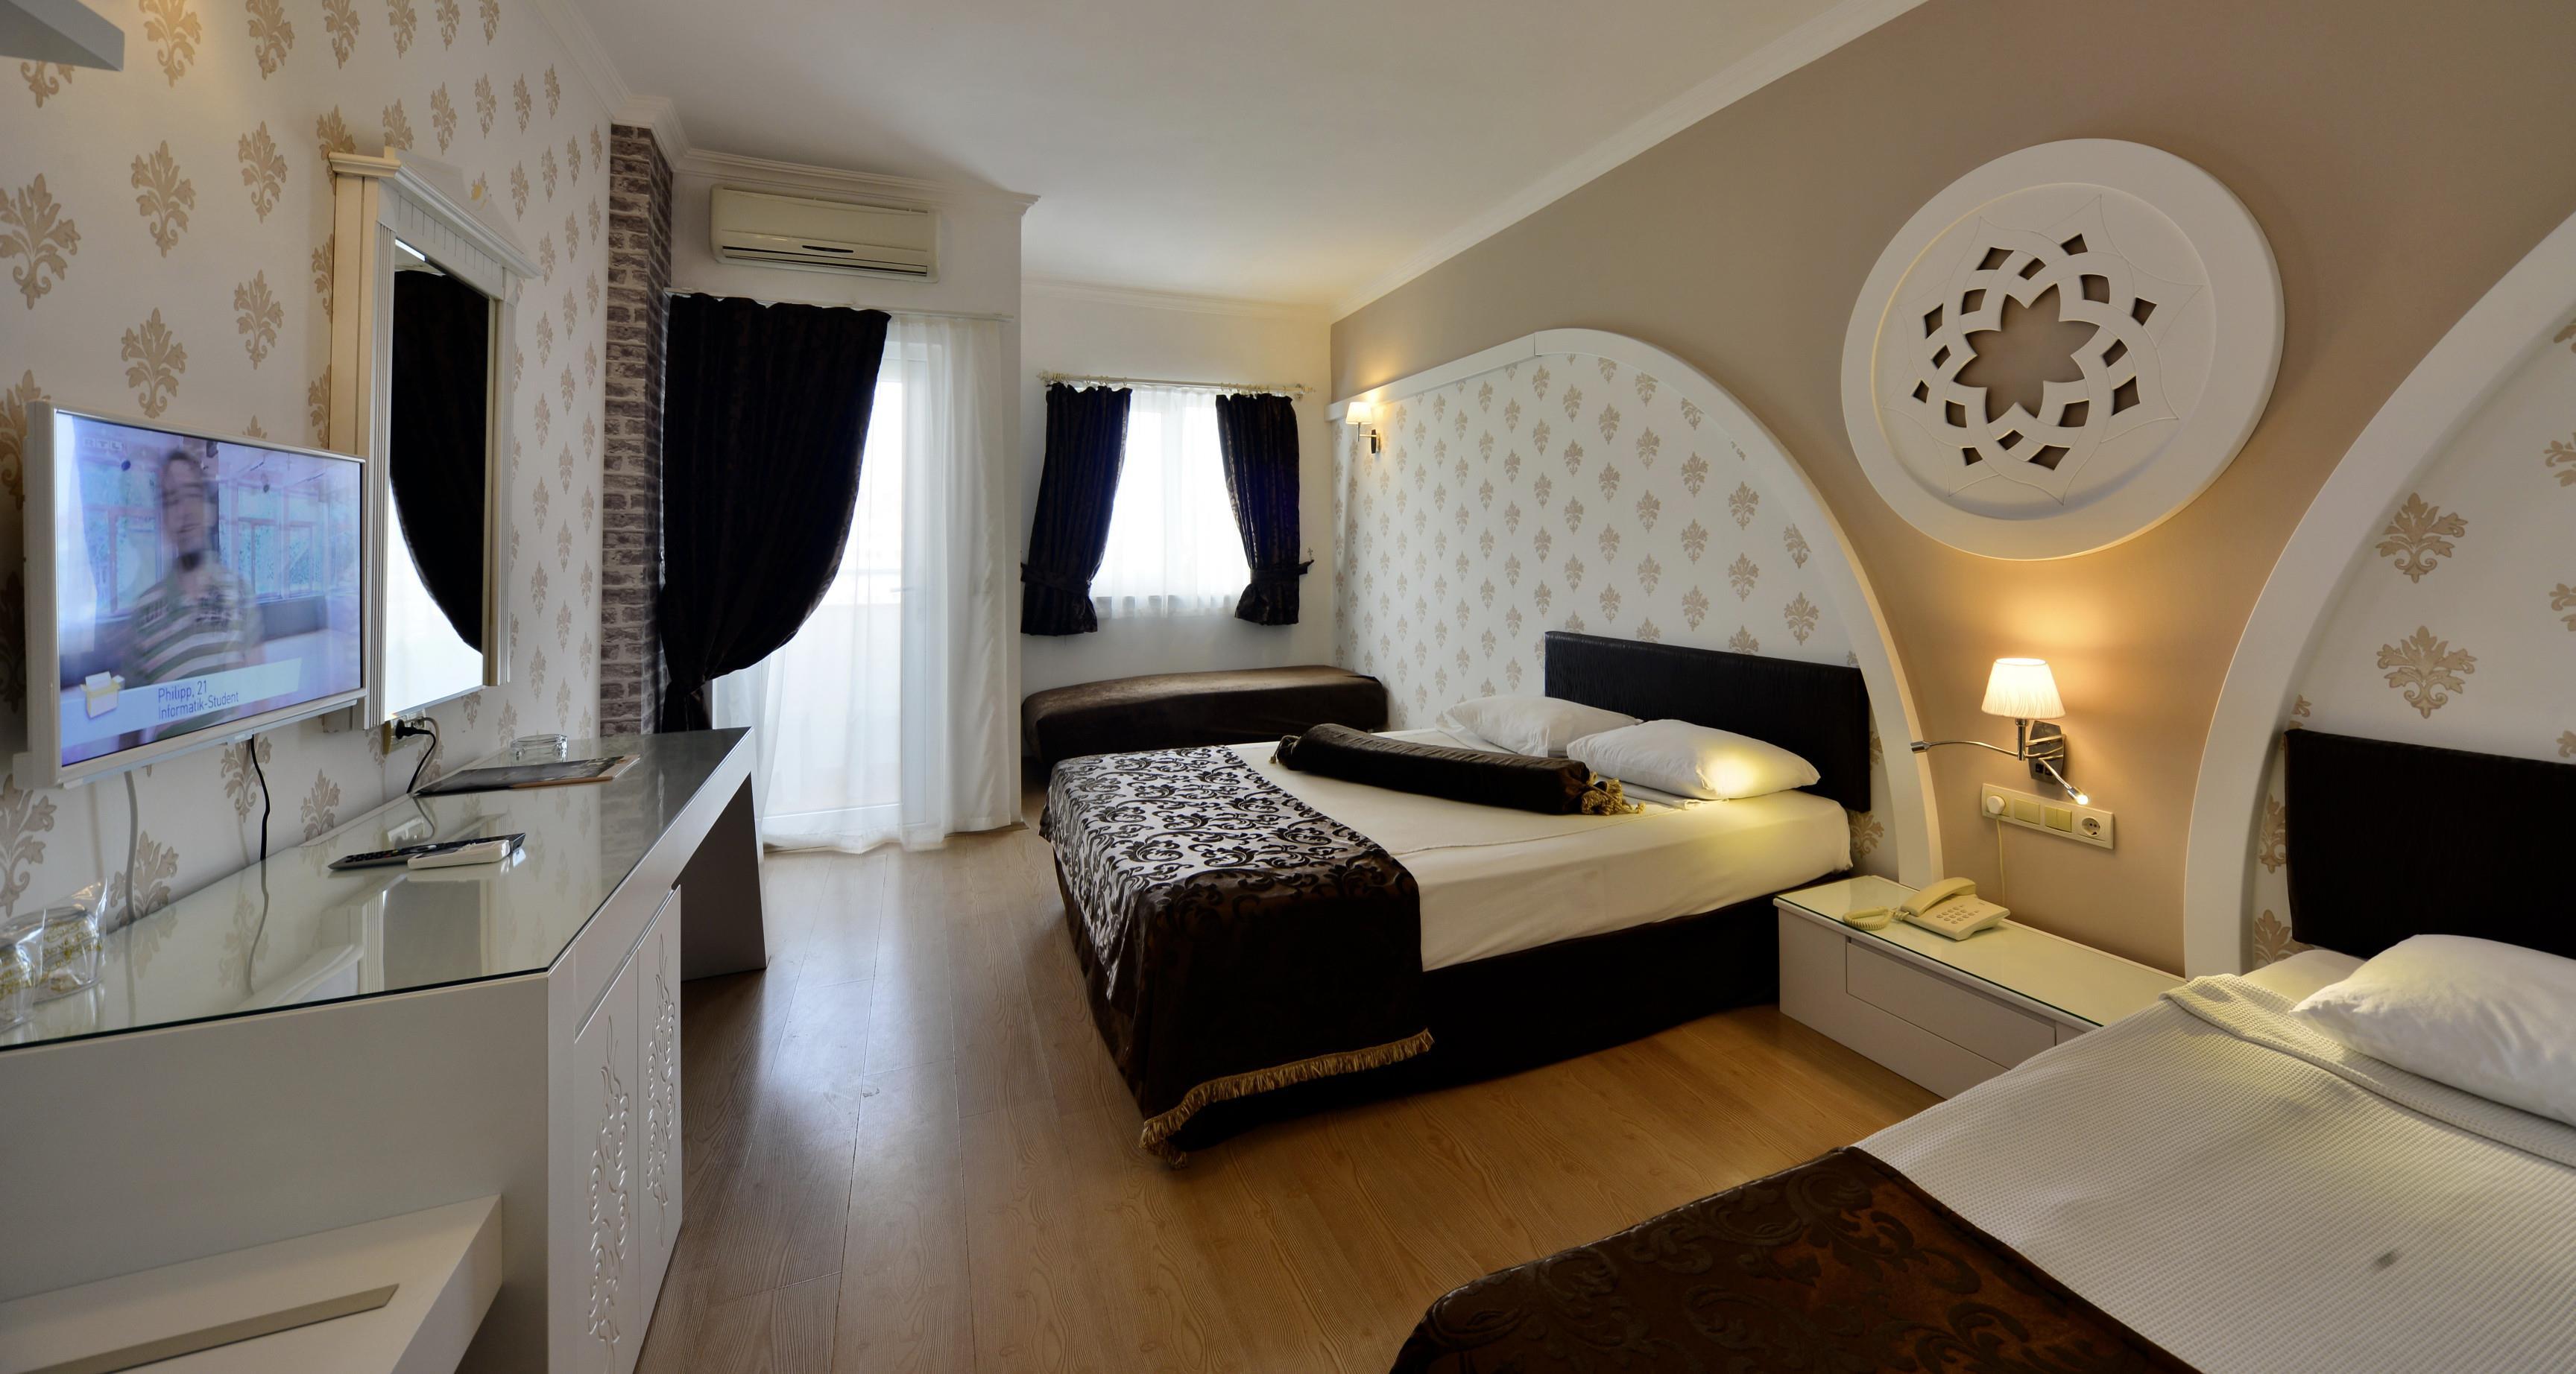 http://www.orextravel.sk/OREX/hotelphotos/side-royal-paradise-general-008.jpg